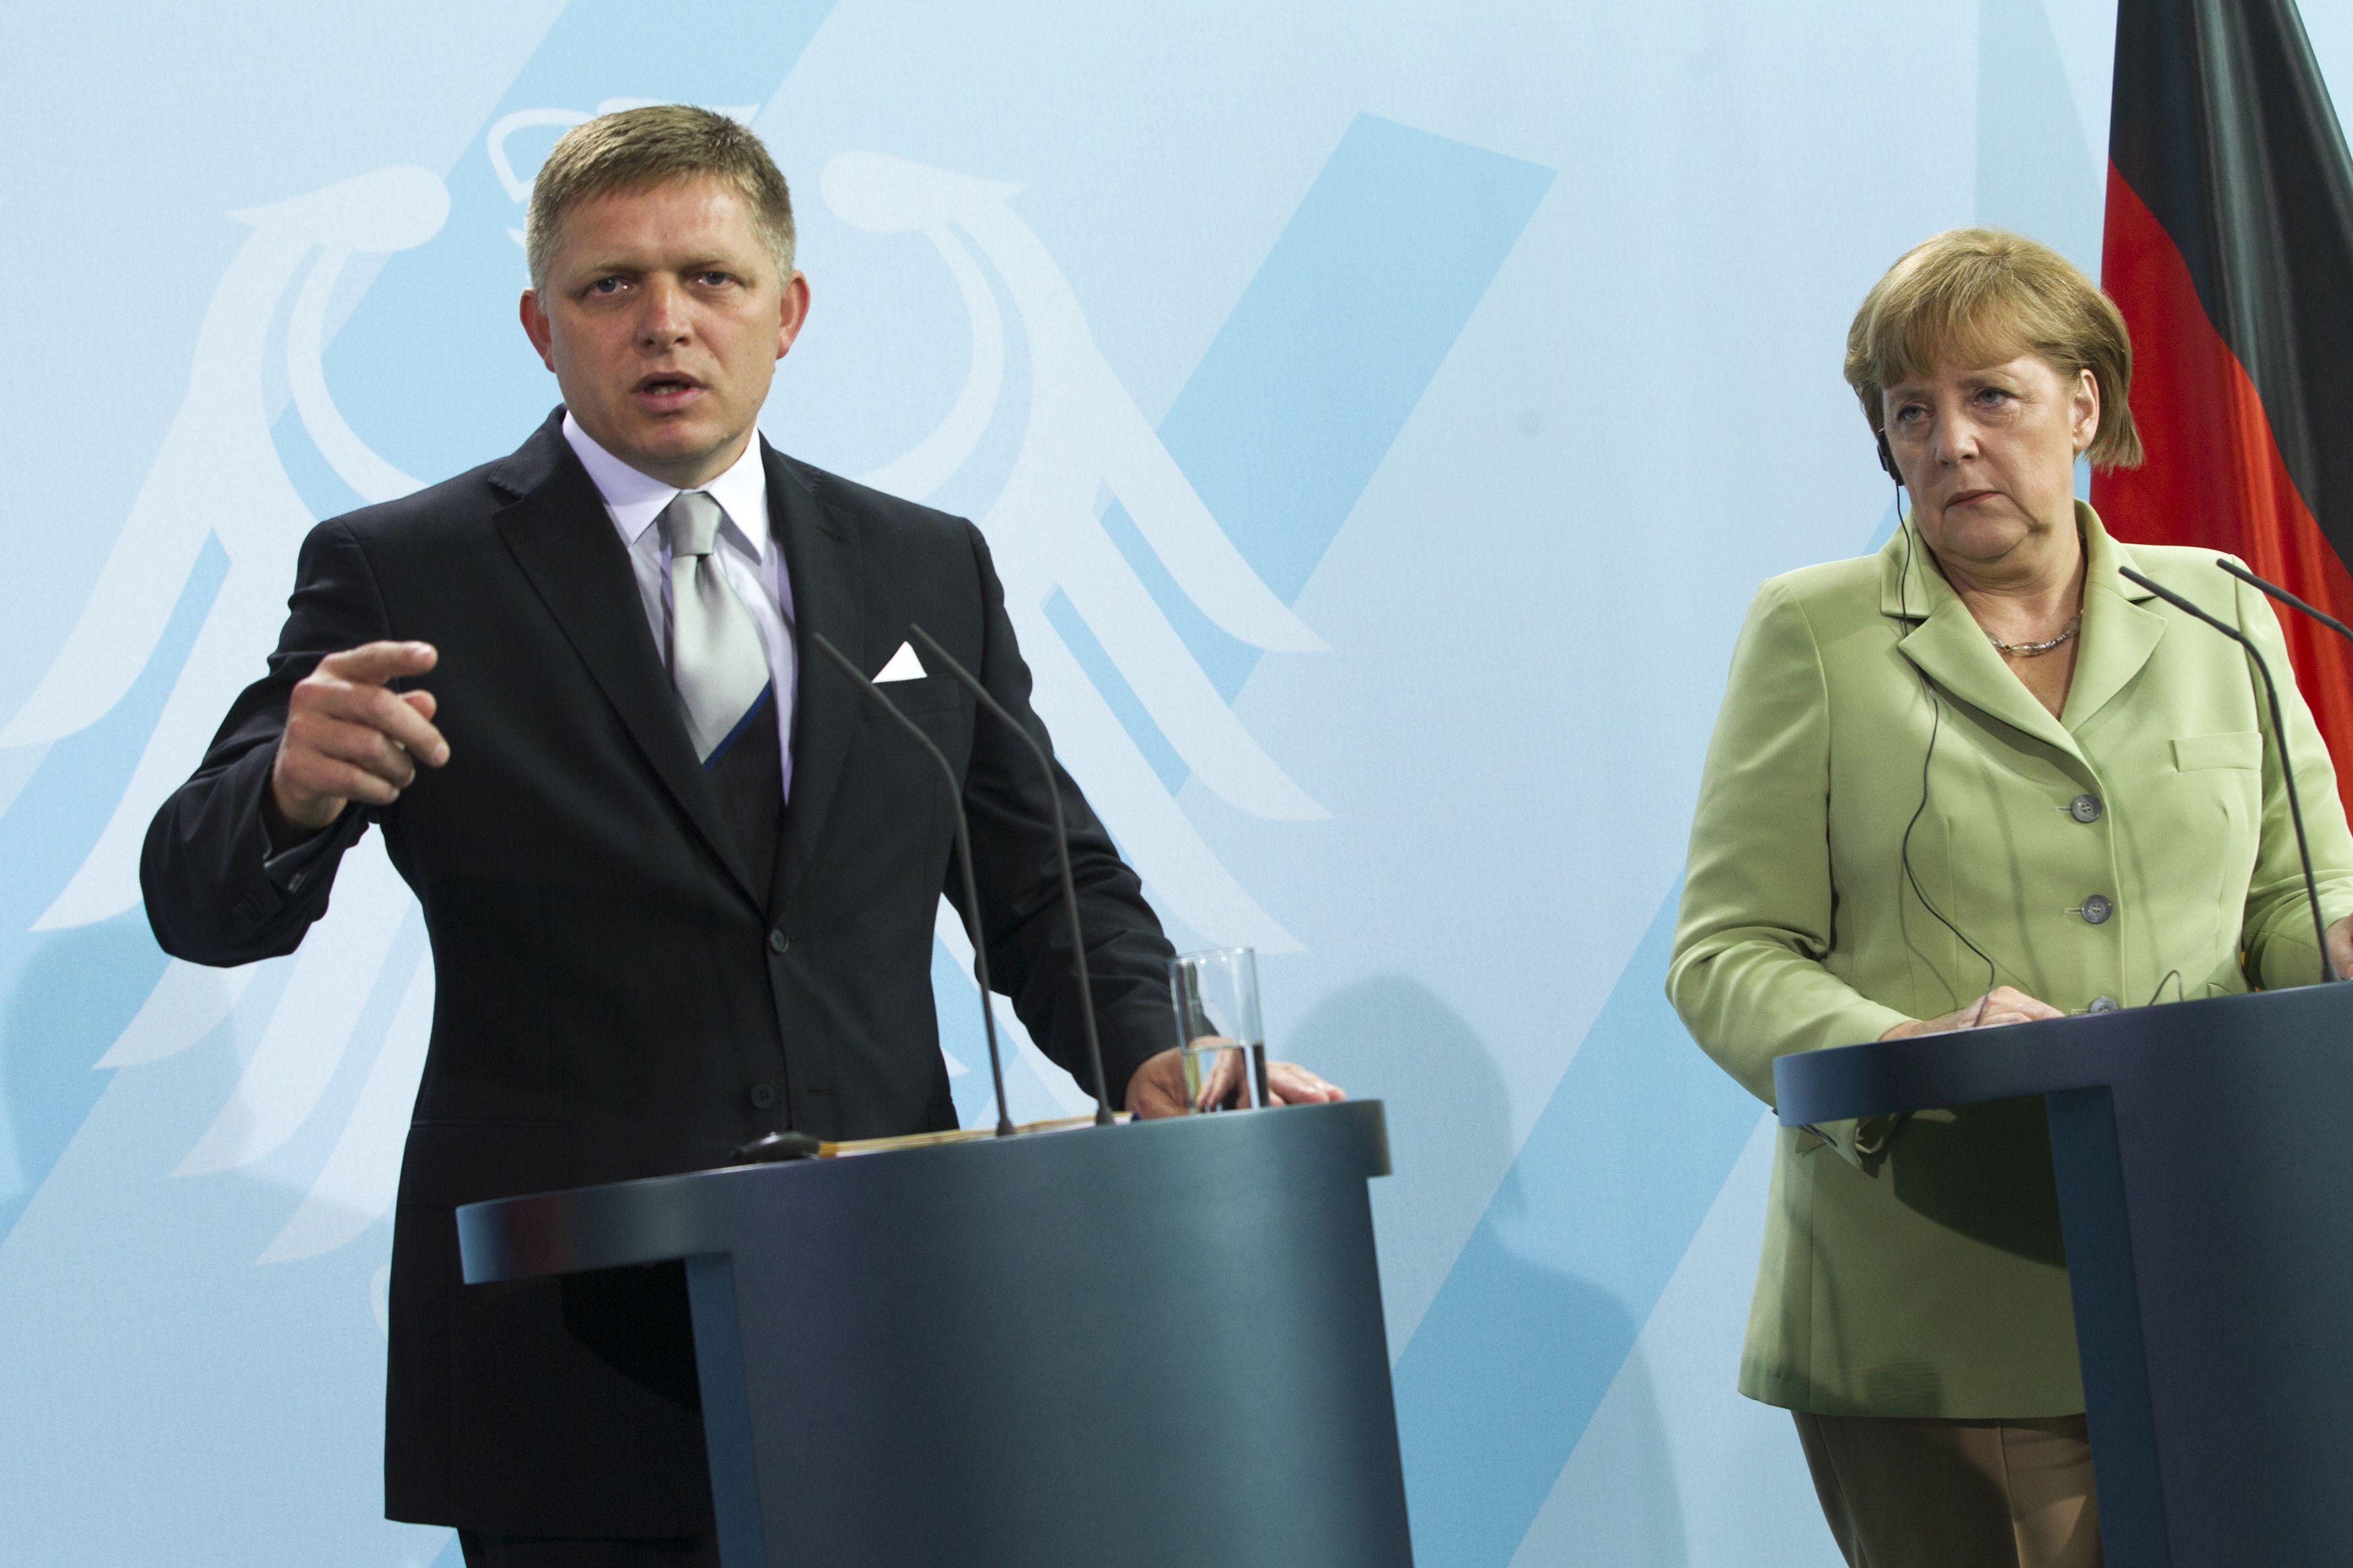 Slovakijos premjeras Robertas Fico: �Ir did�s politikai klysta�. De�in�je � Vokietijos kancler�. Thomaso Peterio (�Reuters� / �Scanpix�) nuotr.